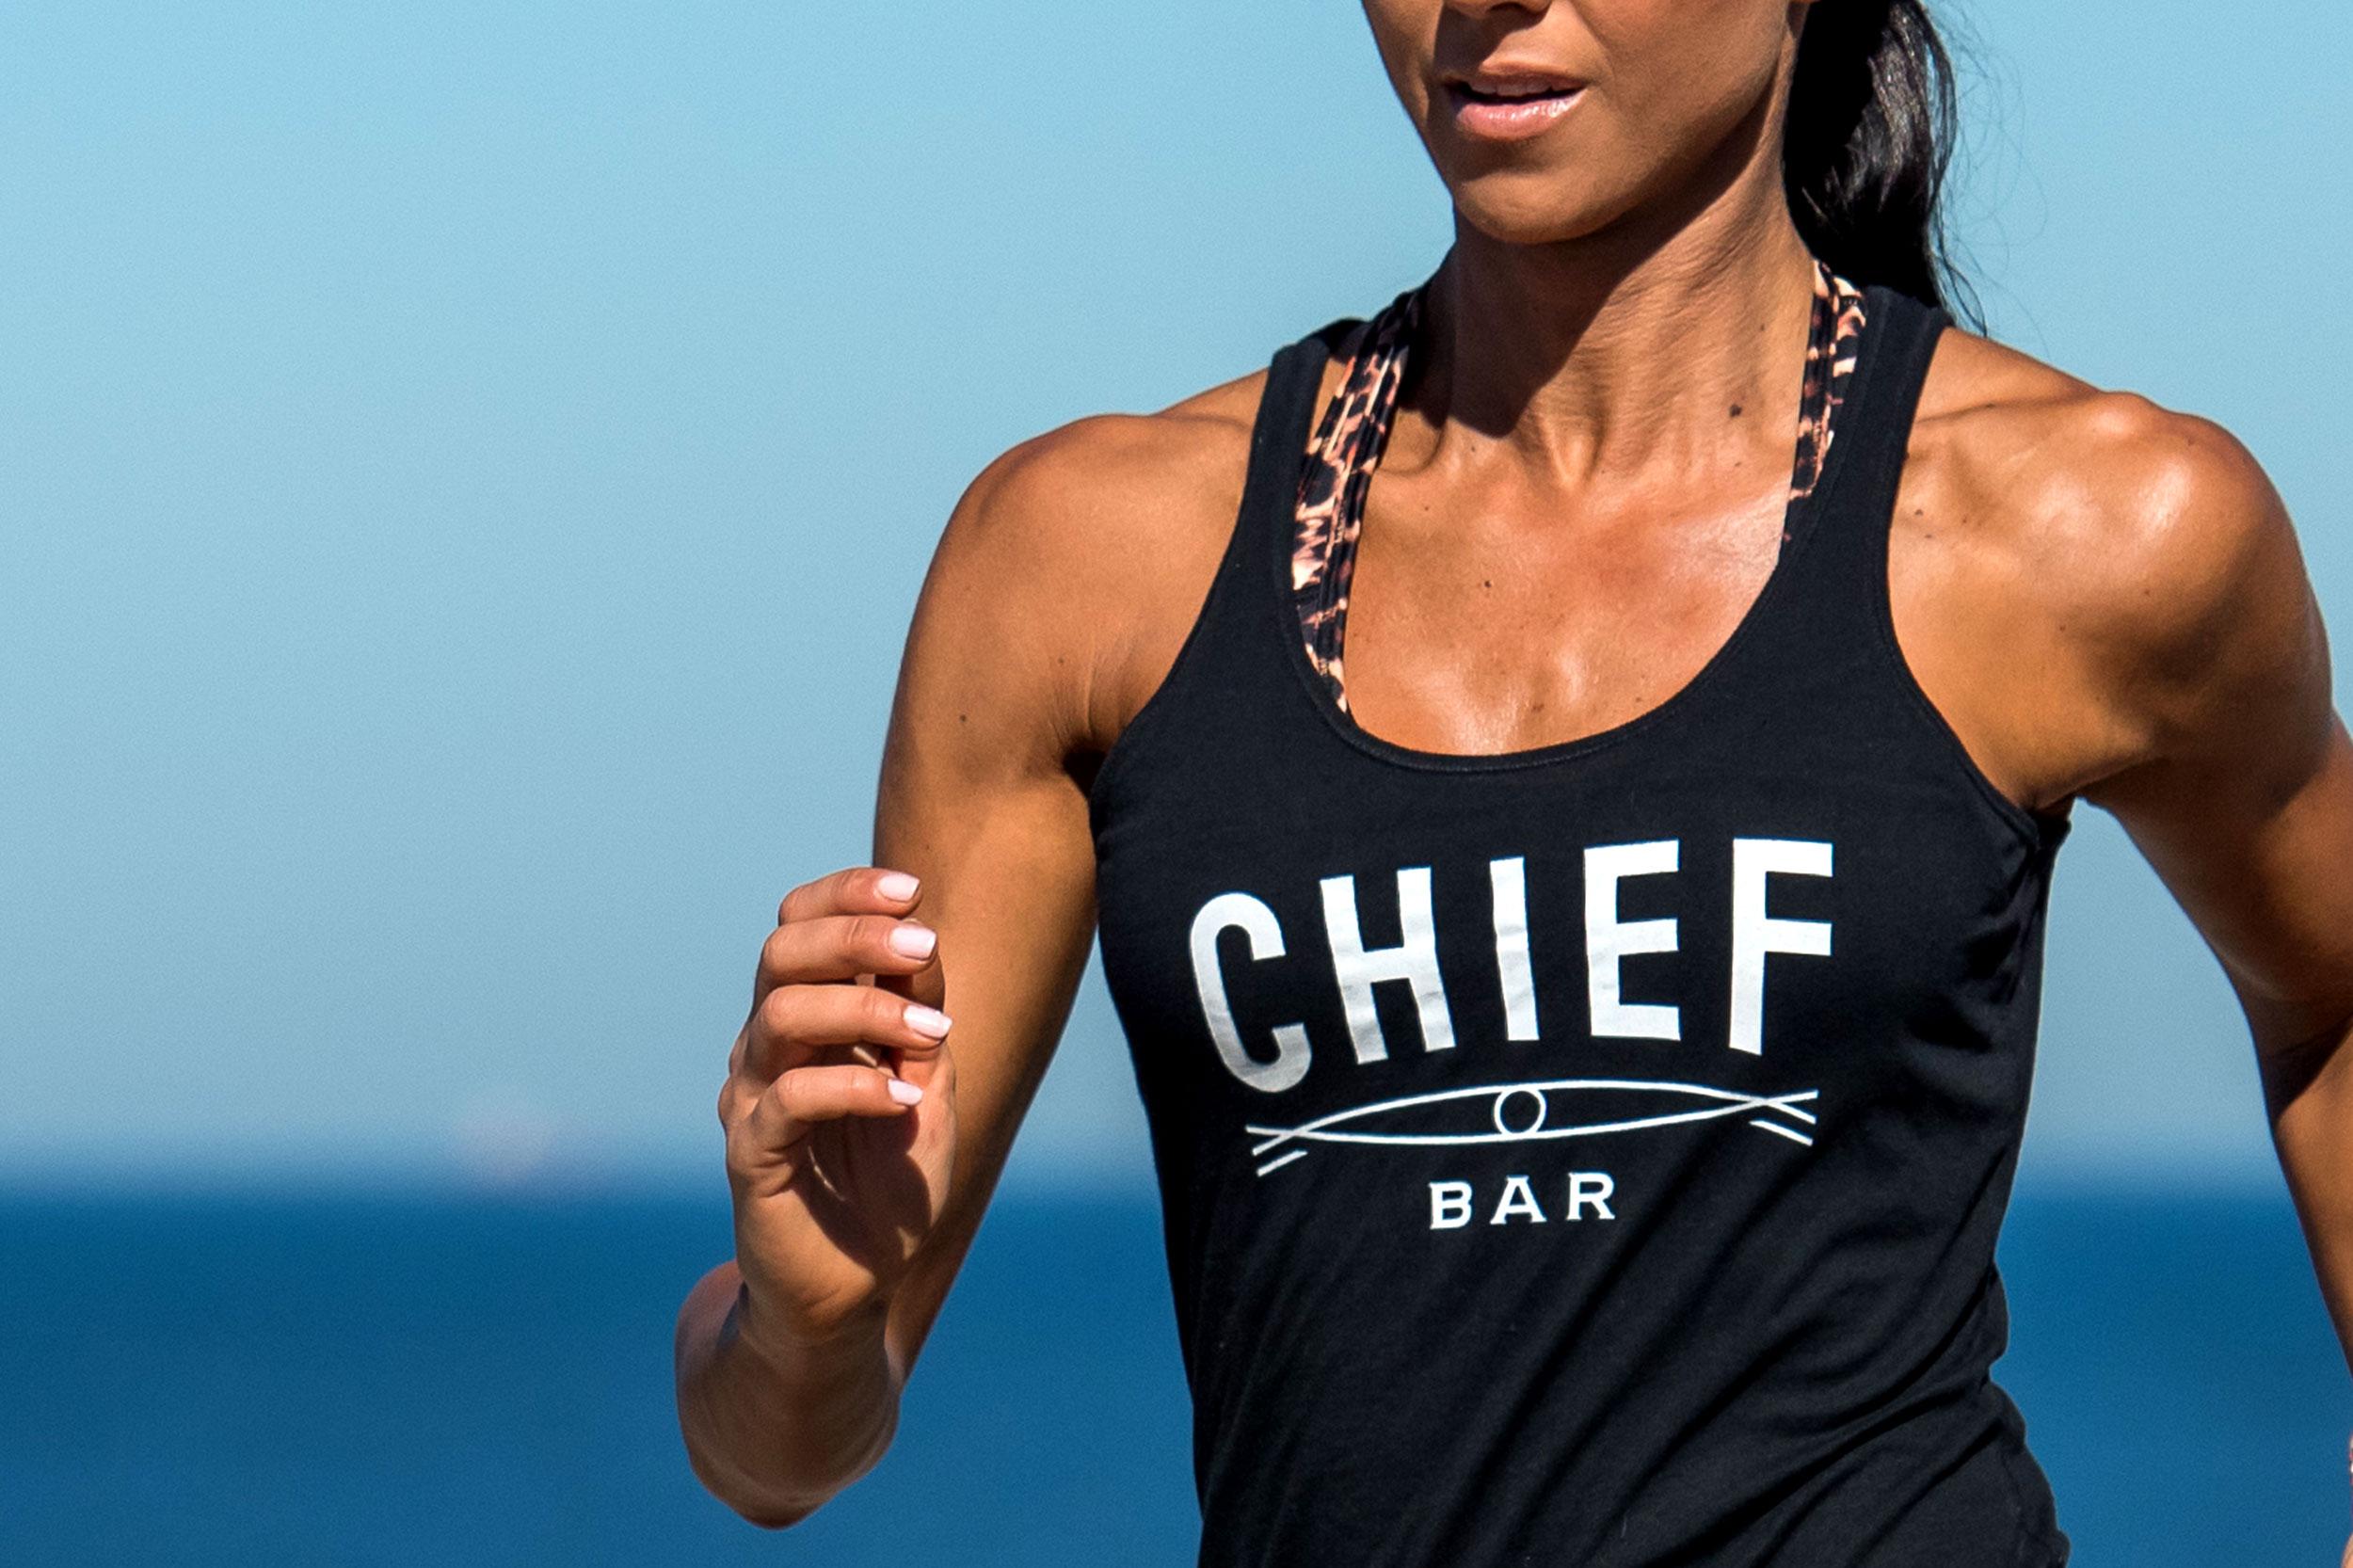 Chief Bar - Graphic Design by Neverland Studio